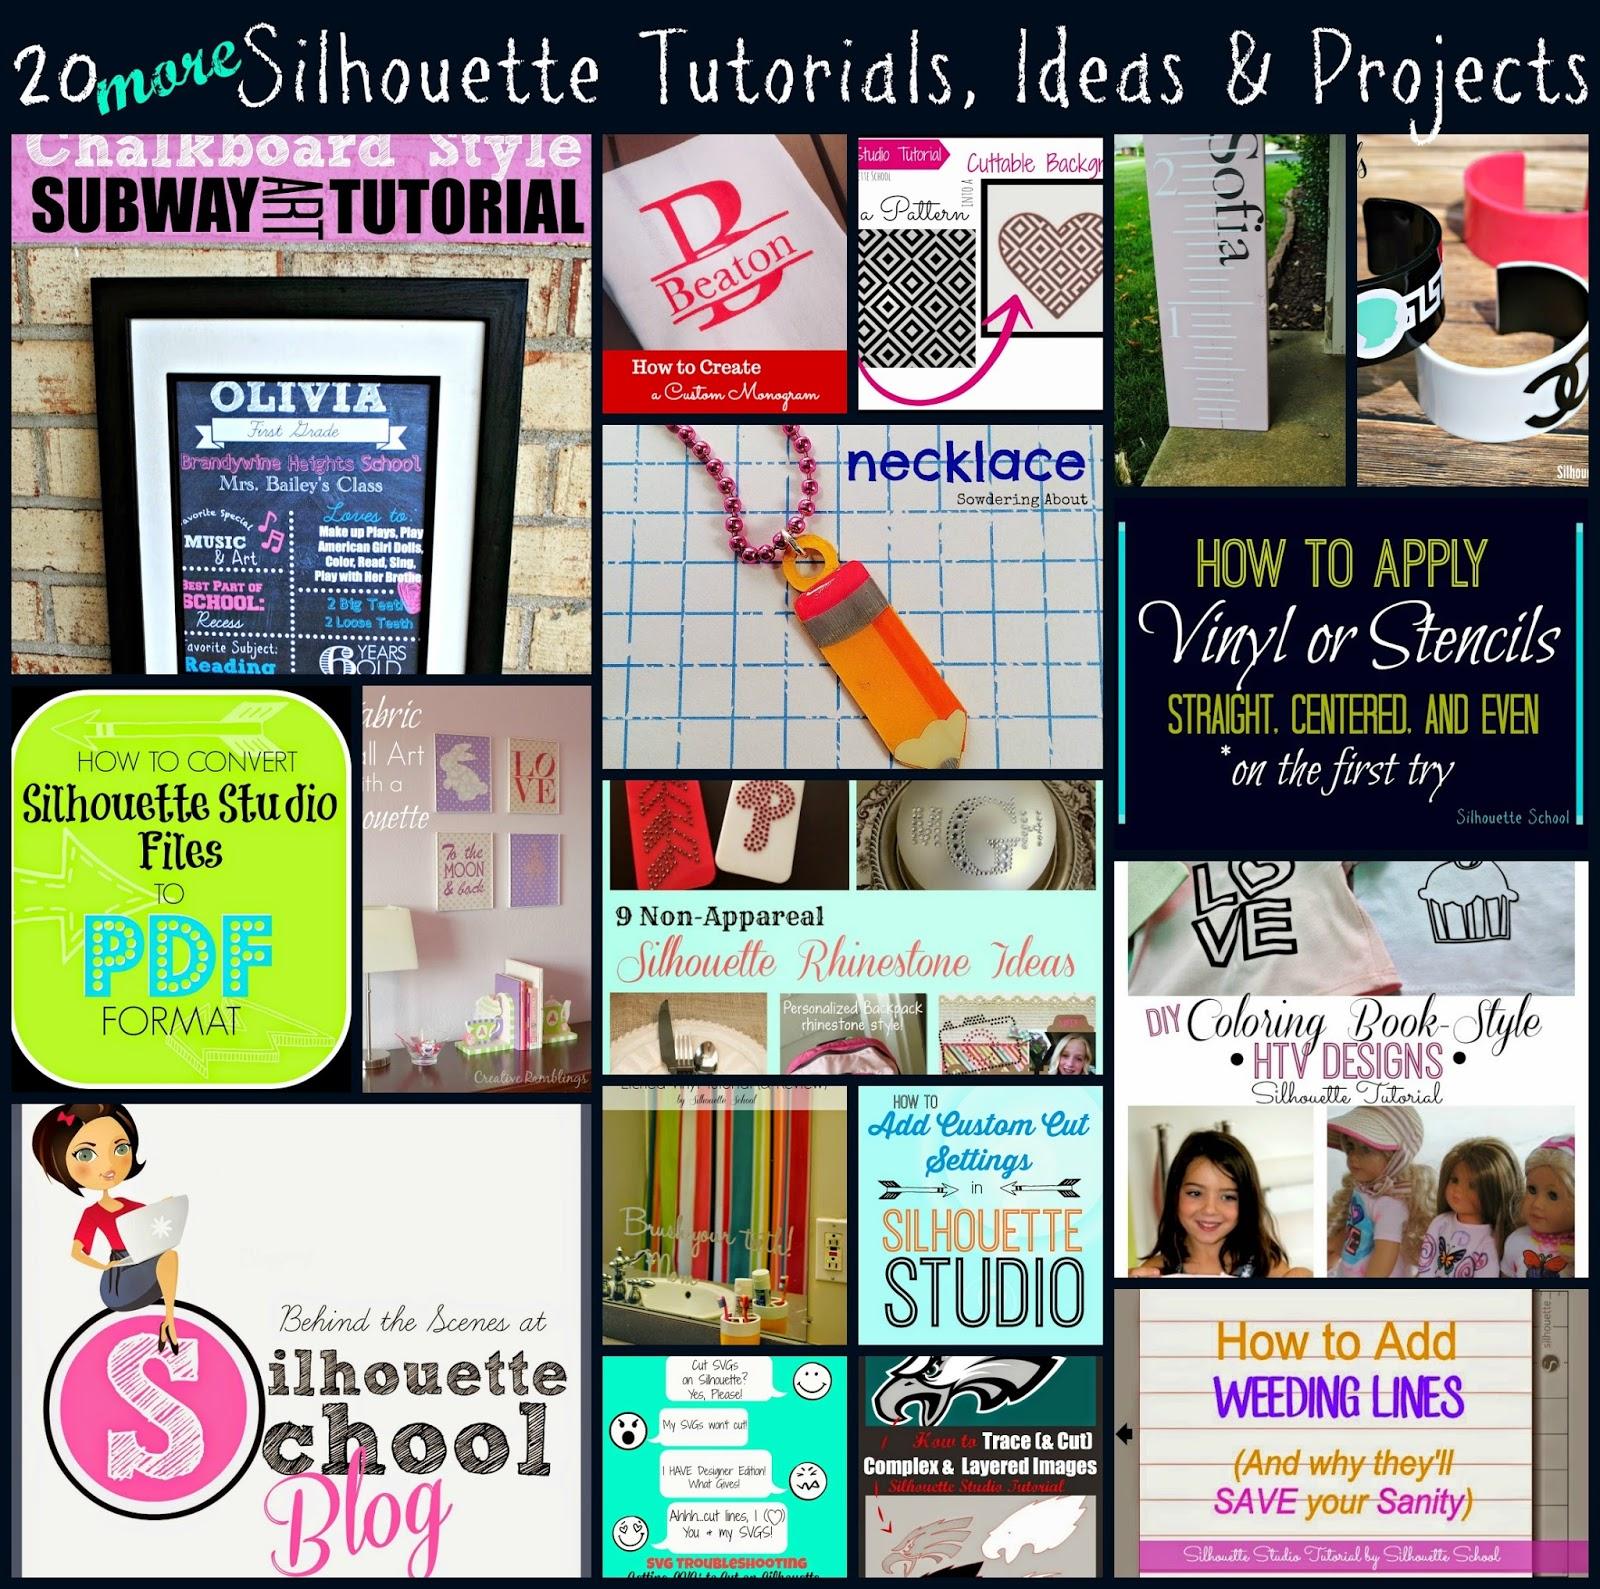 Silhouette, Silhouette tutorial, Silhouette Studio, Silhouette Cameo, Silhouette School Blog